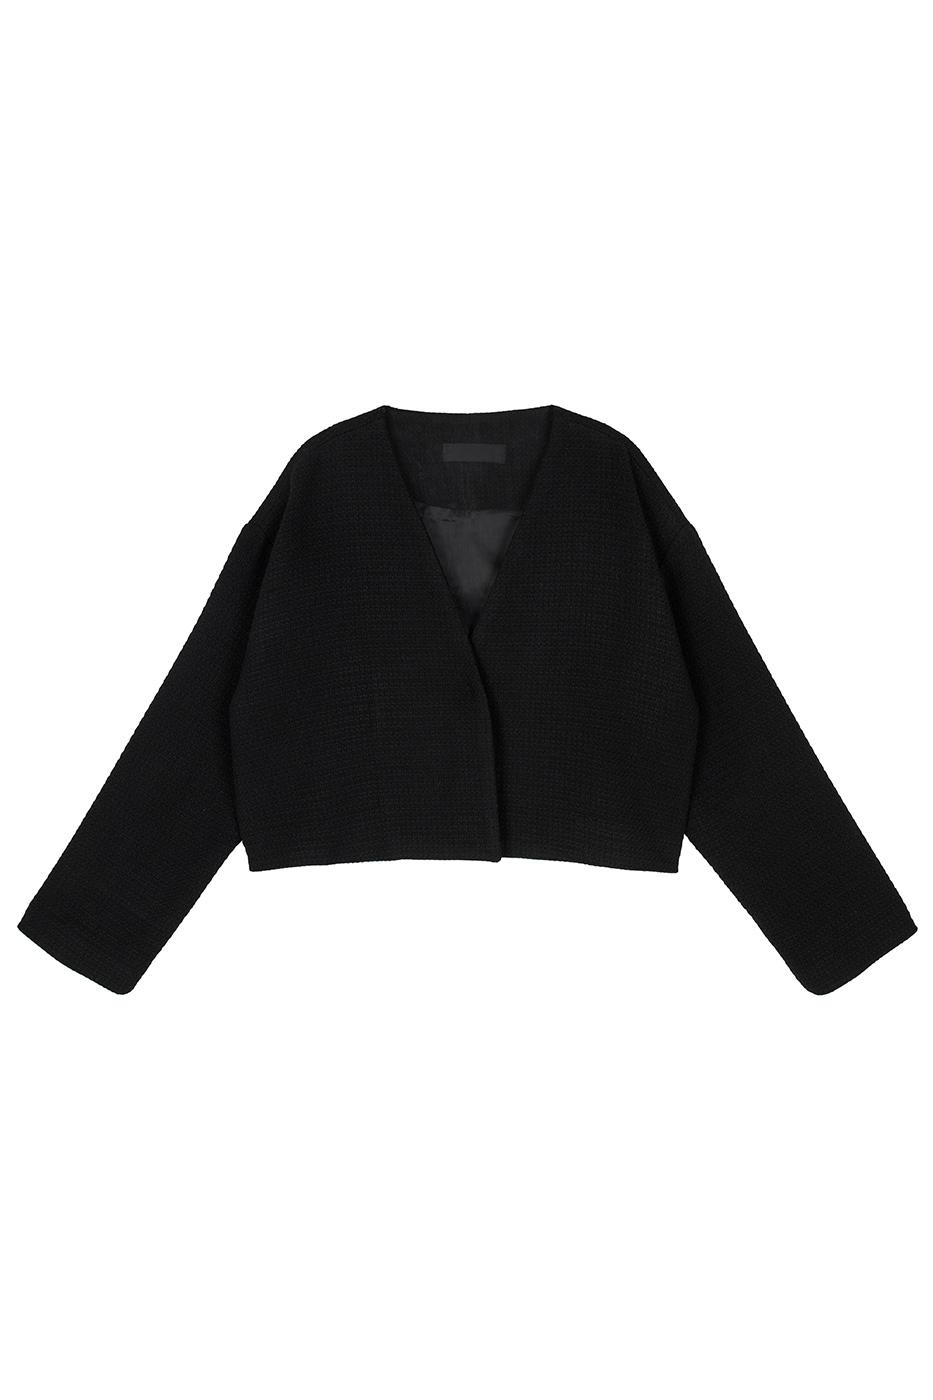 Terry cararis tweed jacket